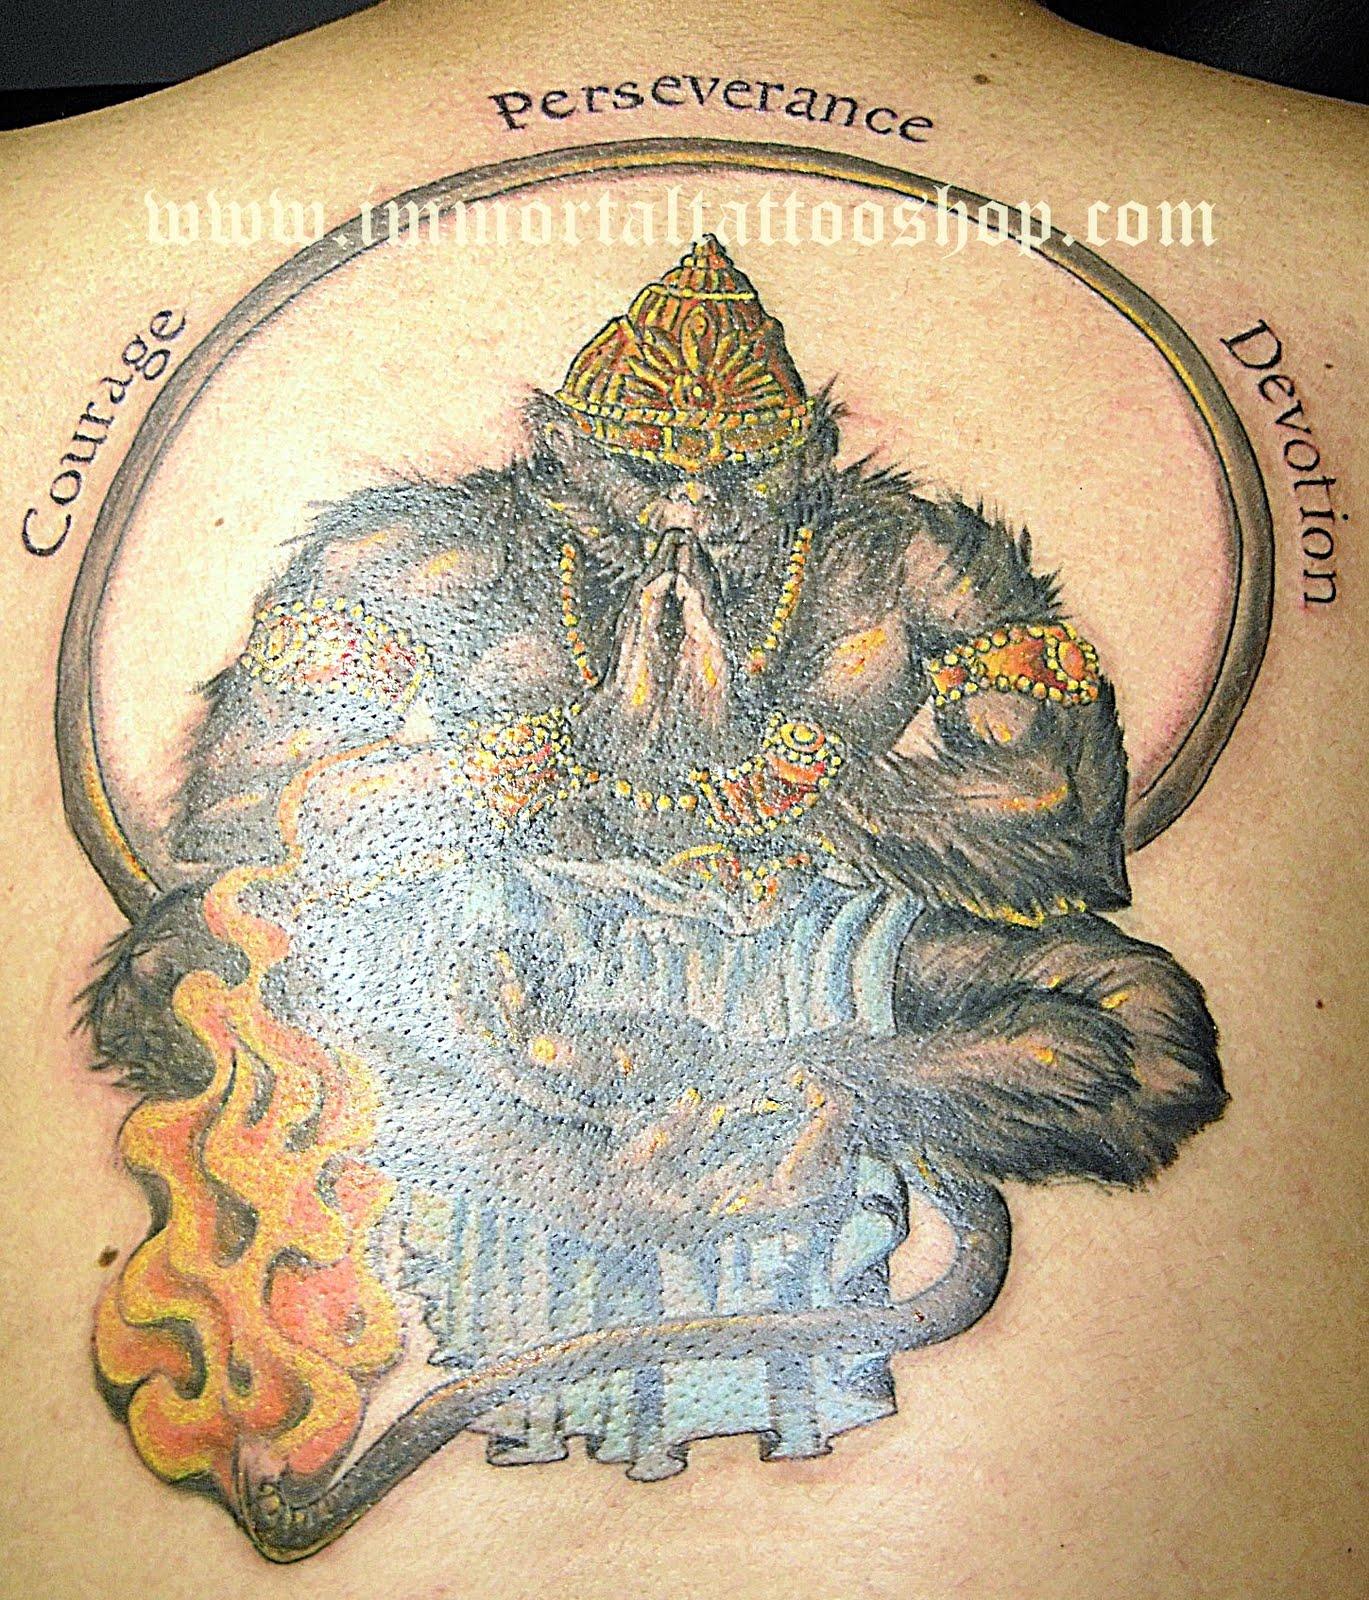 immortal tattoo manila philippines by frank ibanez jr indian hanuman gods tattoo. Black Bedroom Furniture Sets. Home Design Ideas